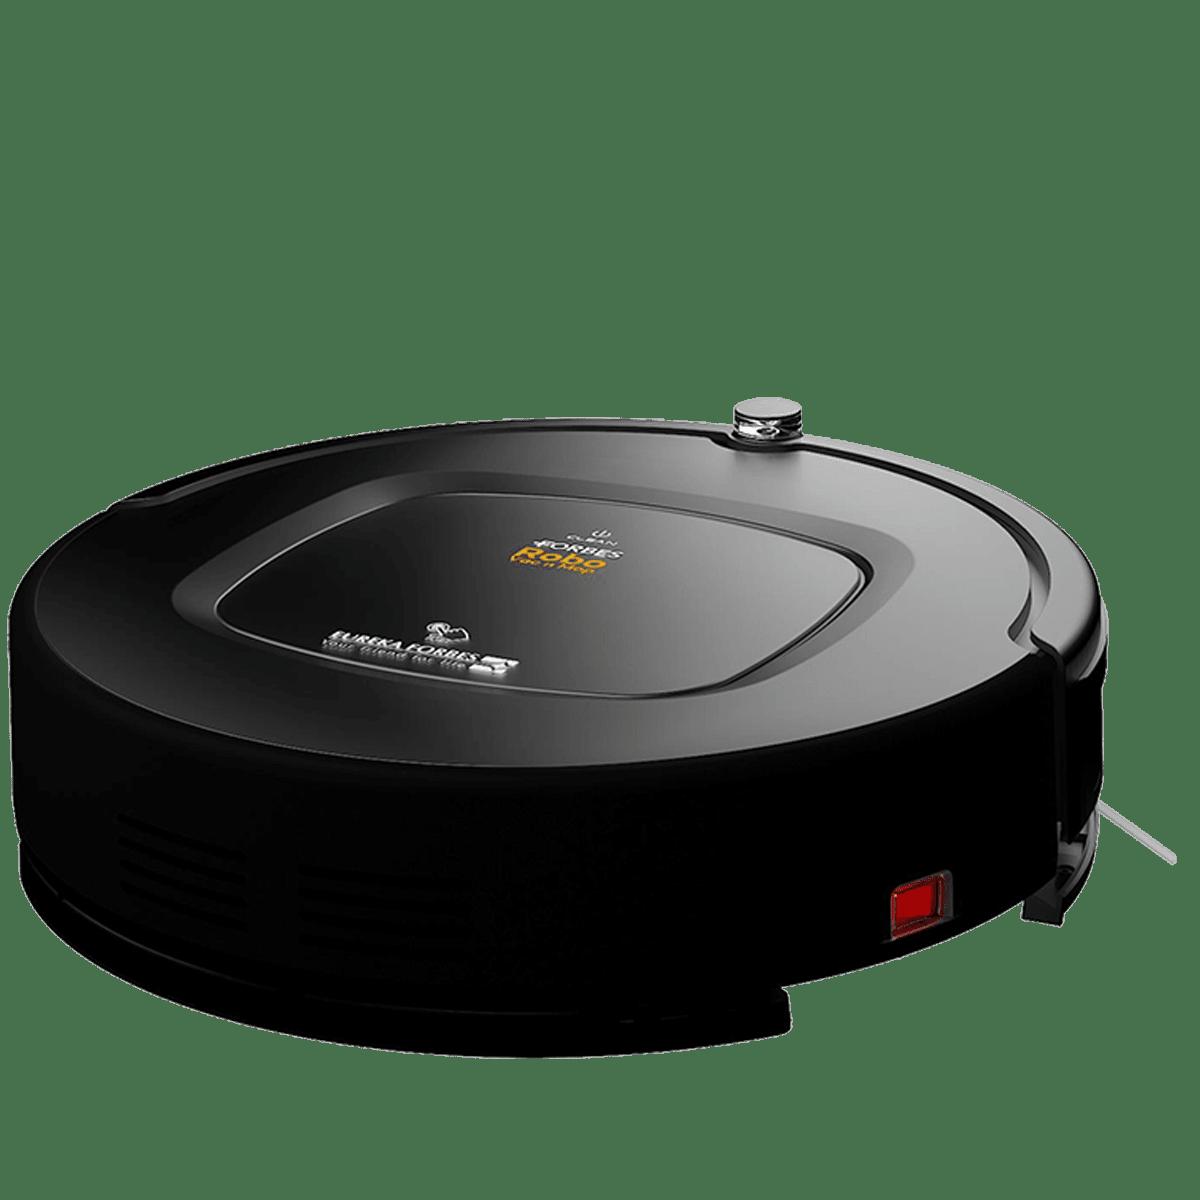 Eureka Forbes Robo Vac n Mop 16 Watts Robotic Vacuum Cleaner (0.5 Liters Tank, GFCDFRCLN00000, Black)